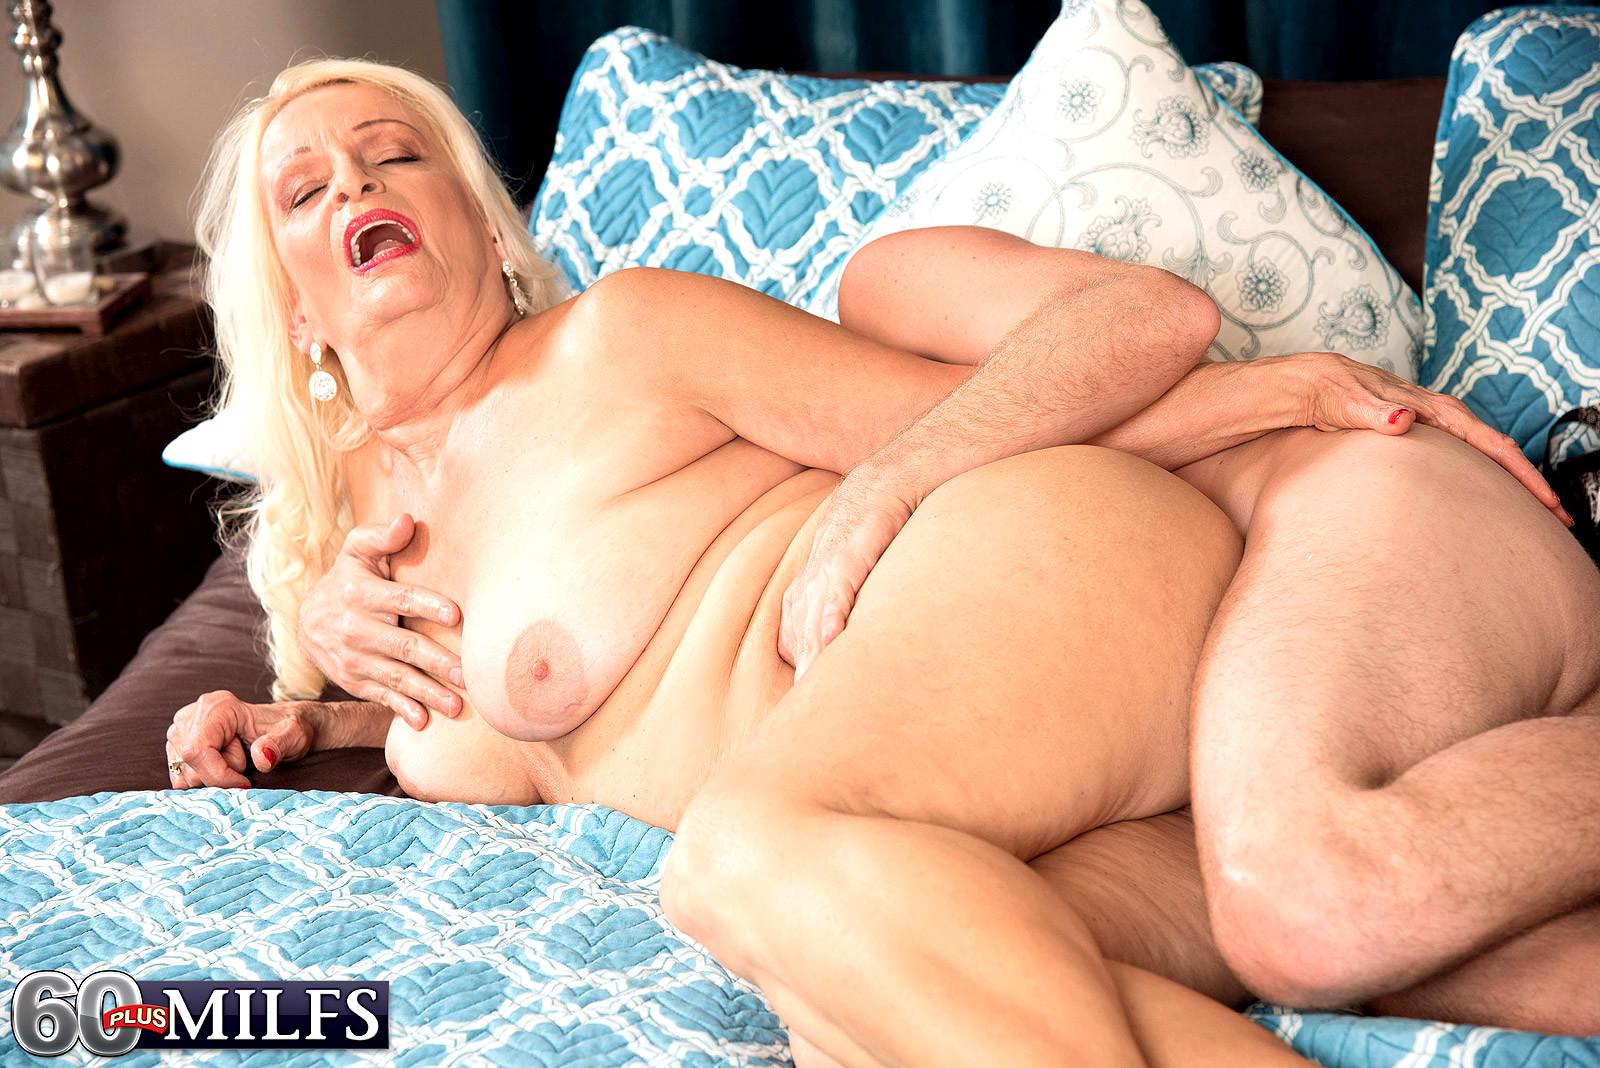 Старушки порно актрисы онлайн — photo 5